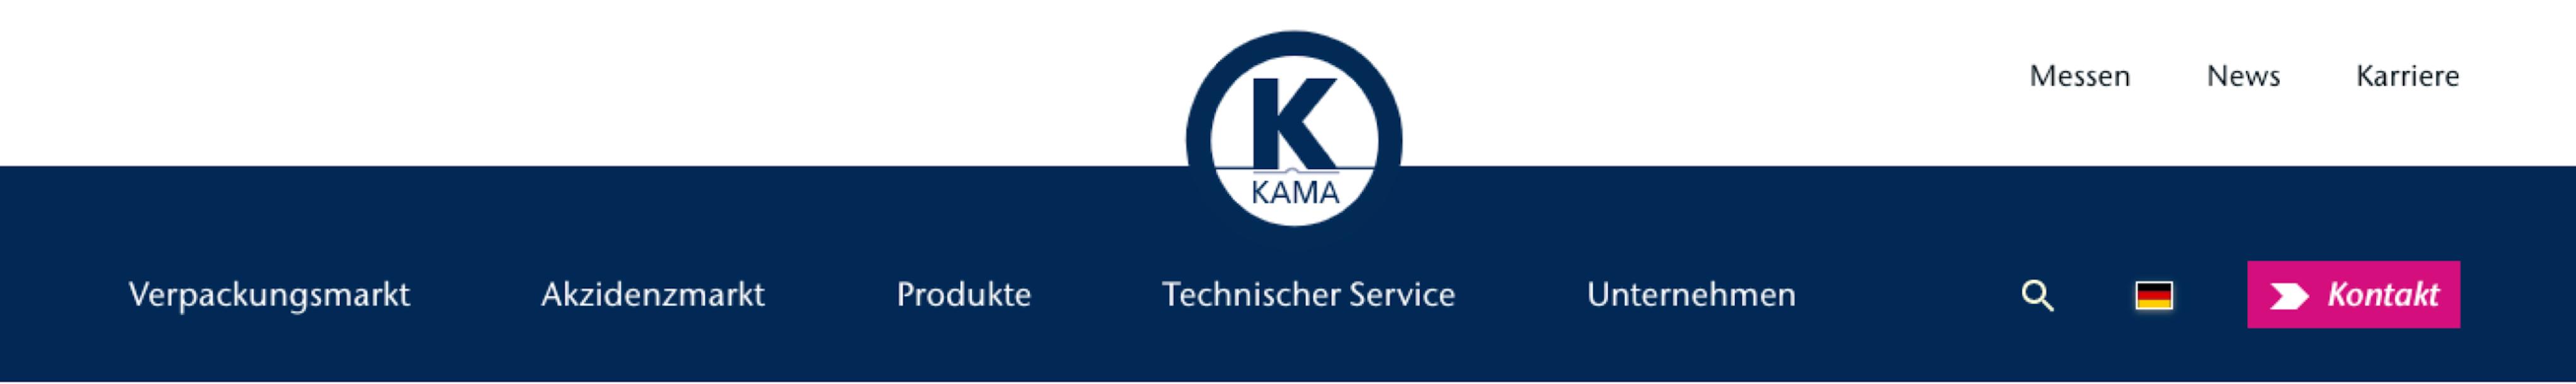 Navigation der KAMA GmbH